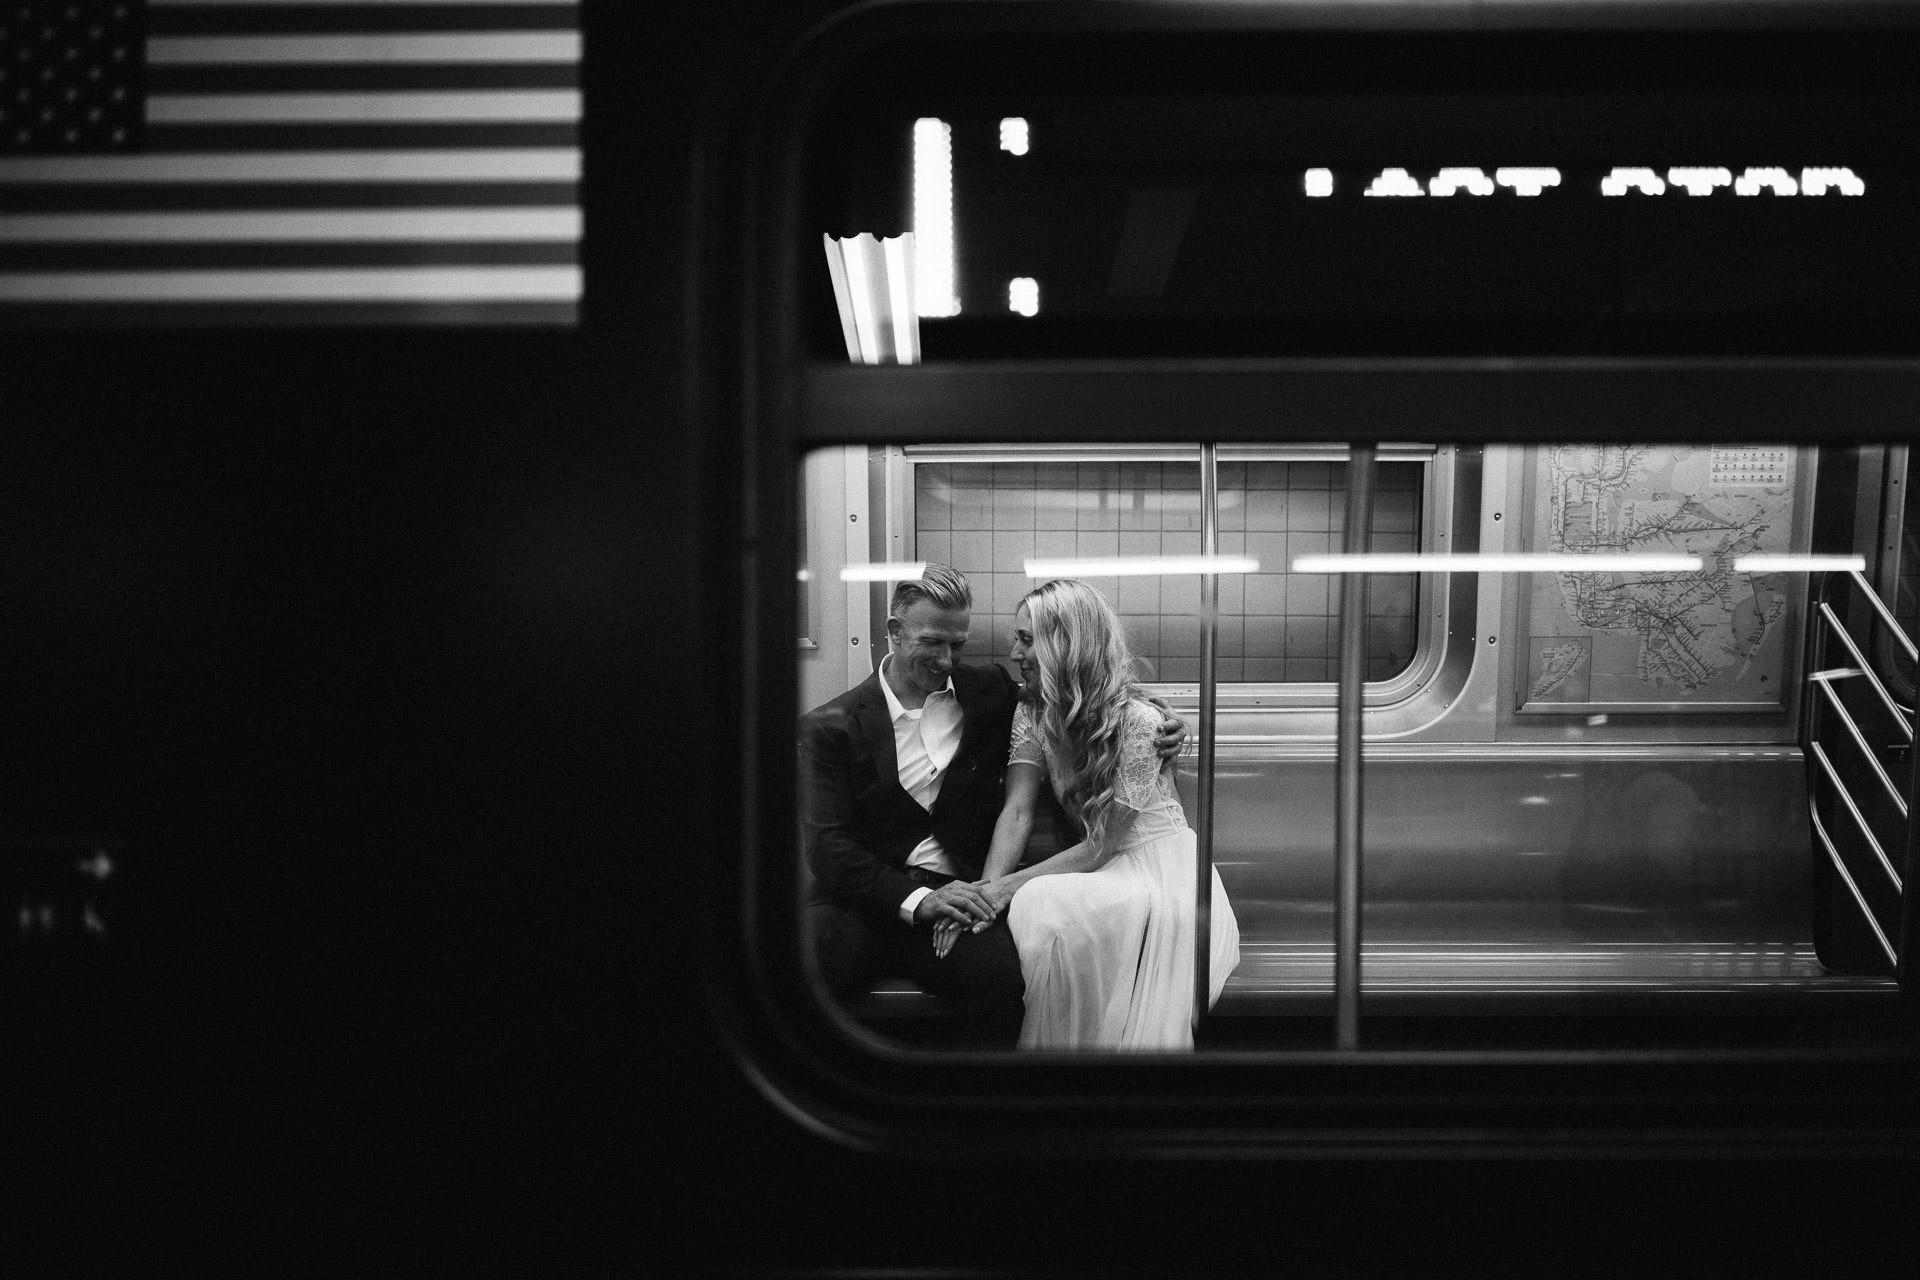 Shana & Tyler Wedding Greenwich Hotel, New York, by Jean-Laurent Gaudy